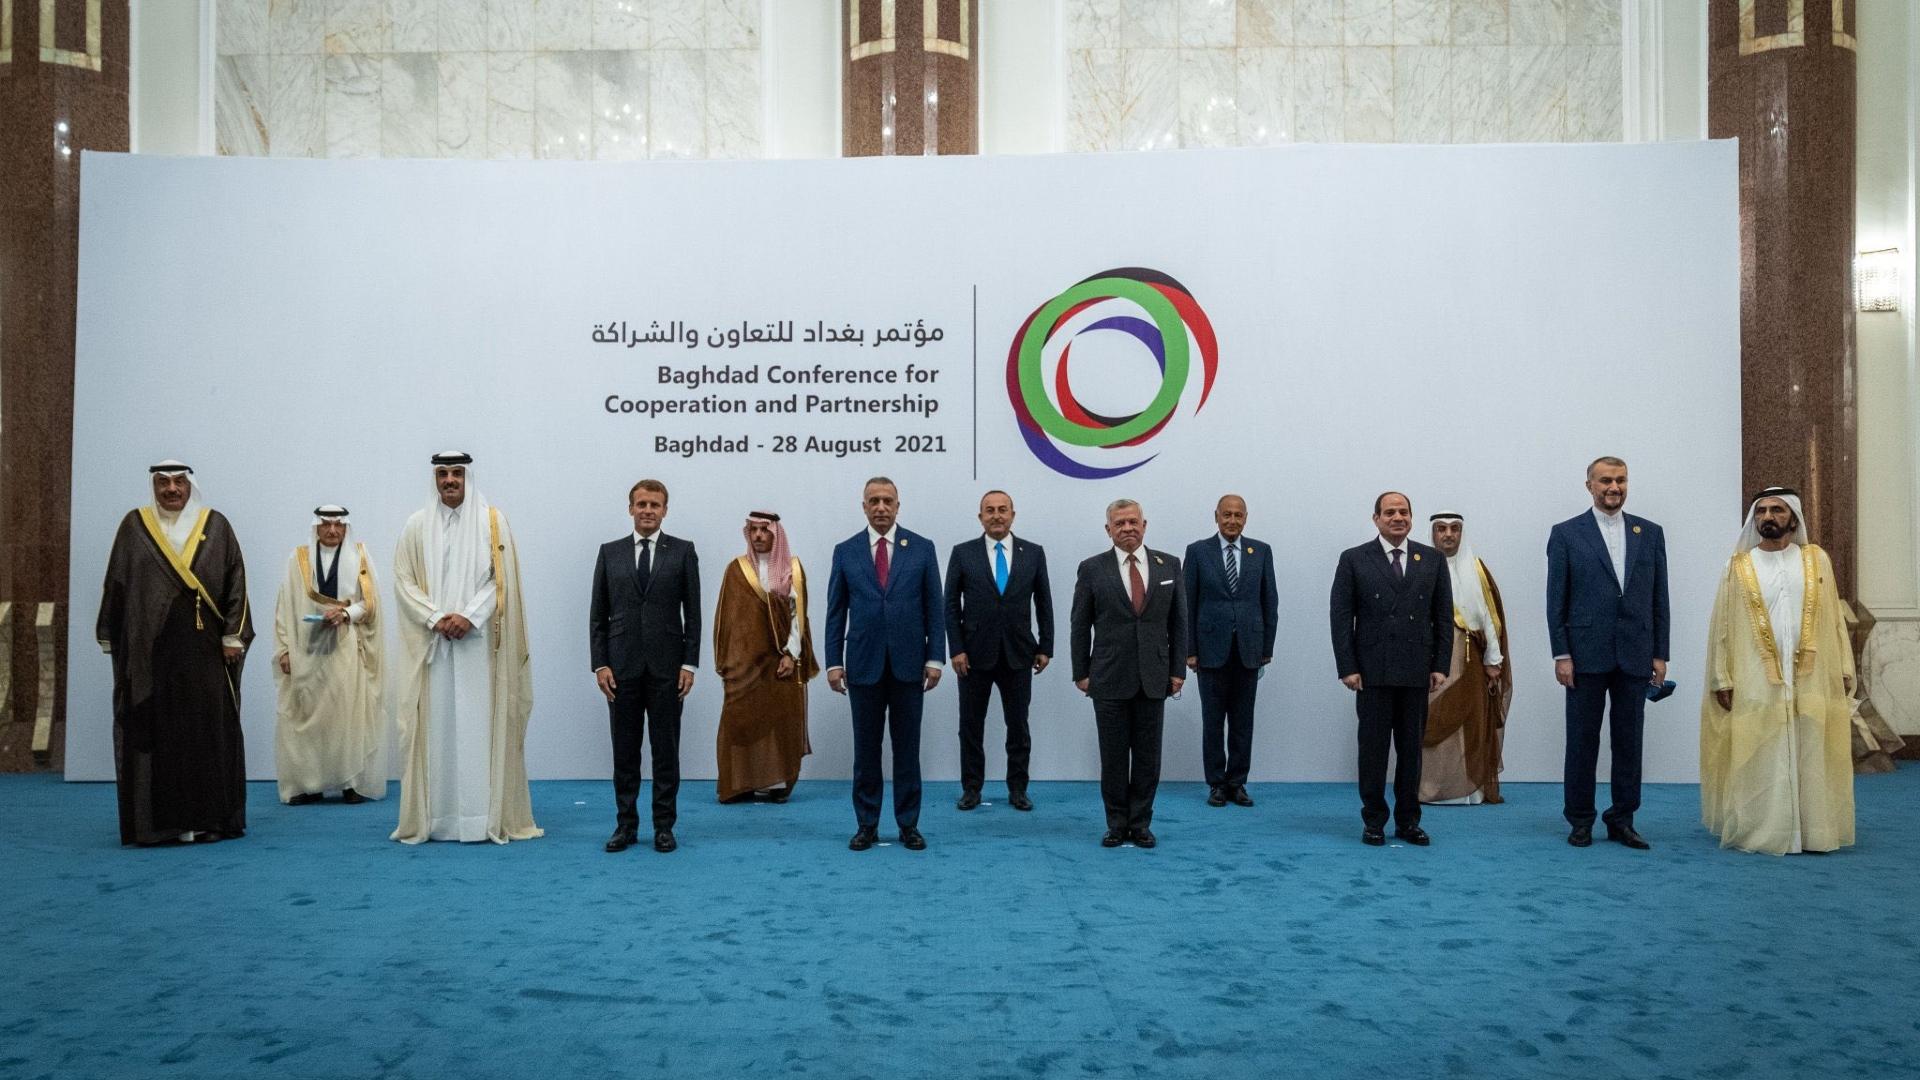 انعقاد مؤتمر بغداد للتعاون والشراكة